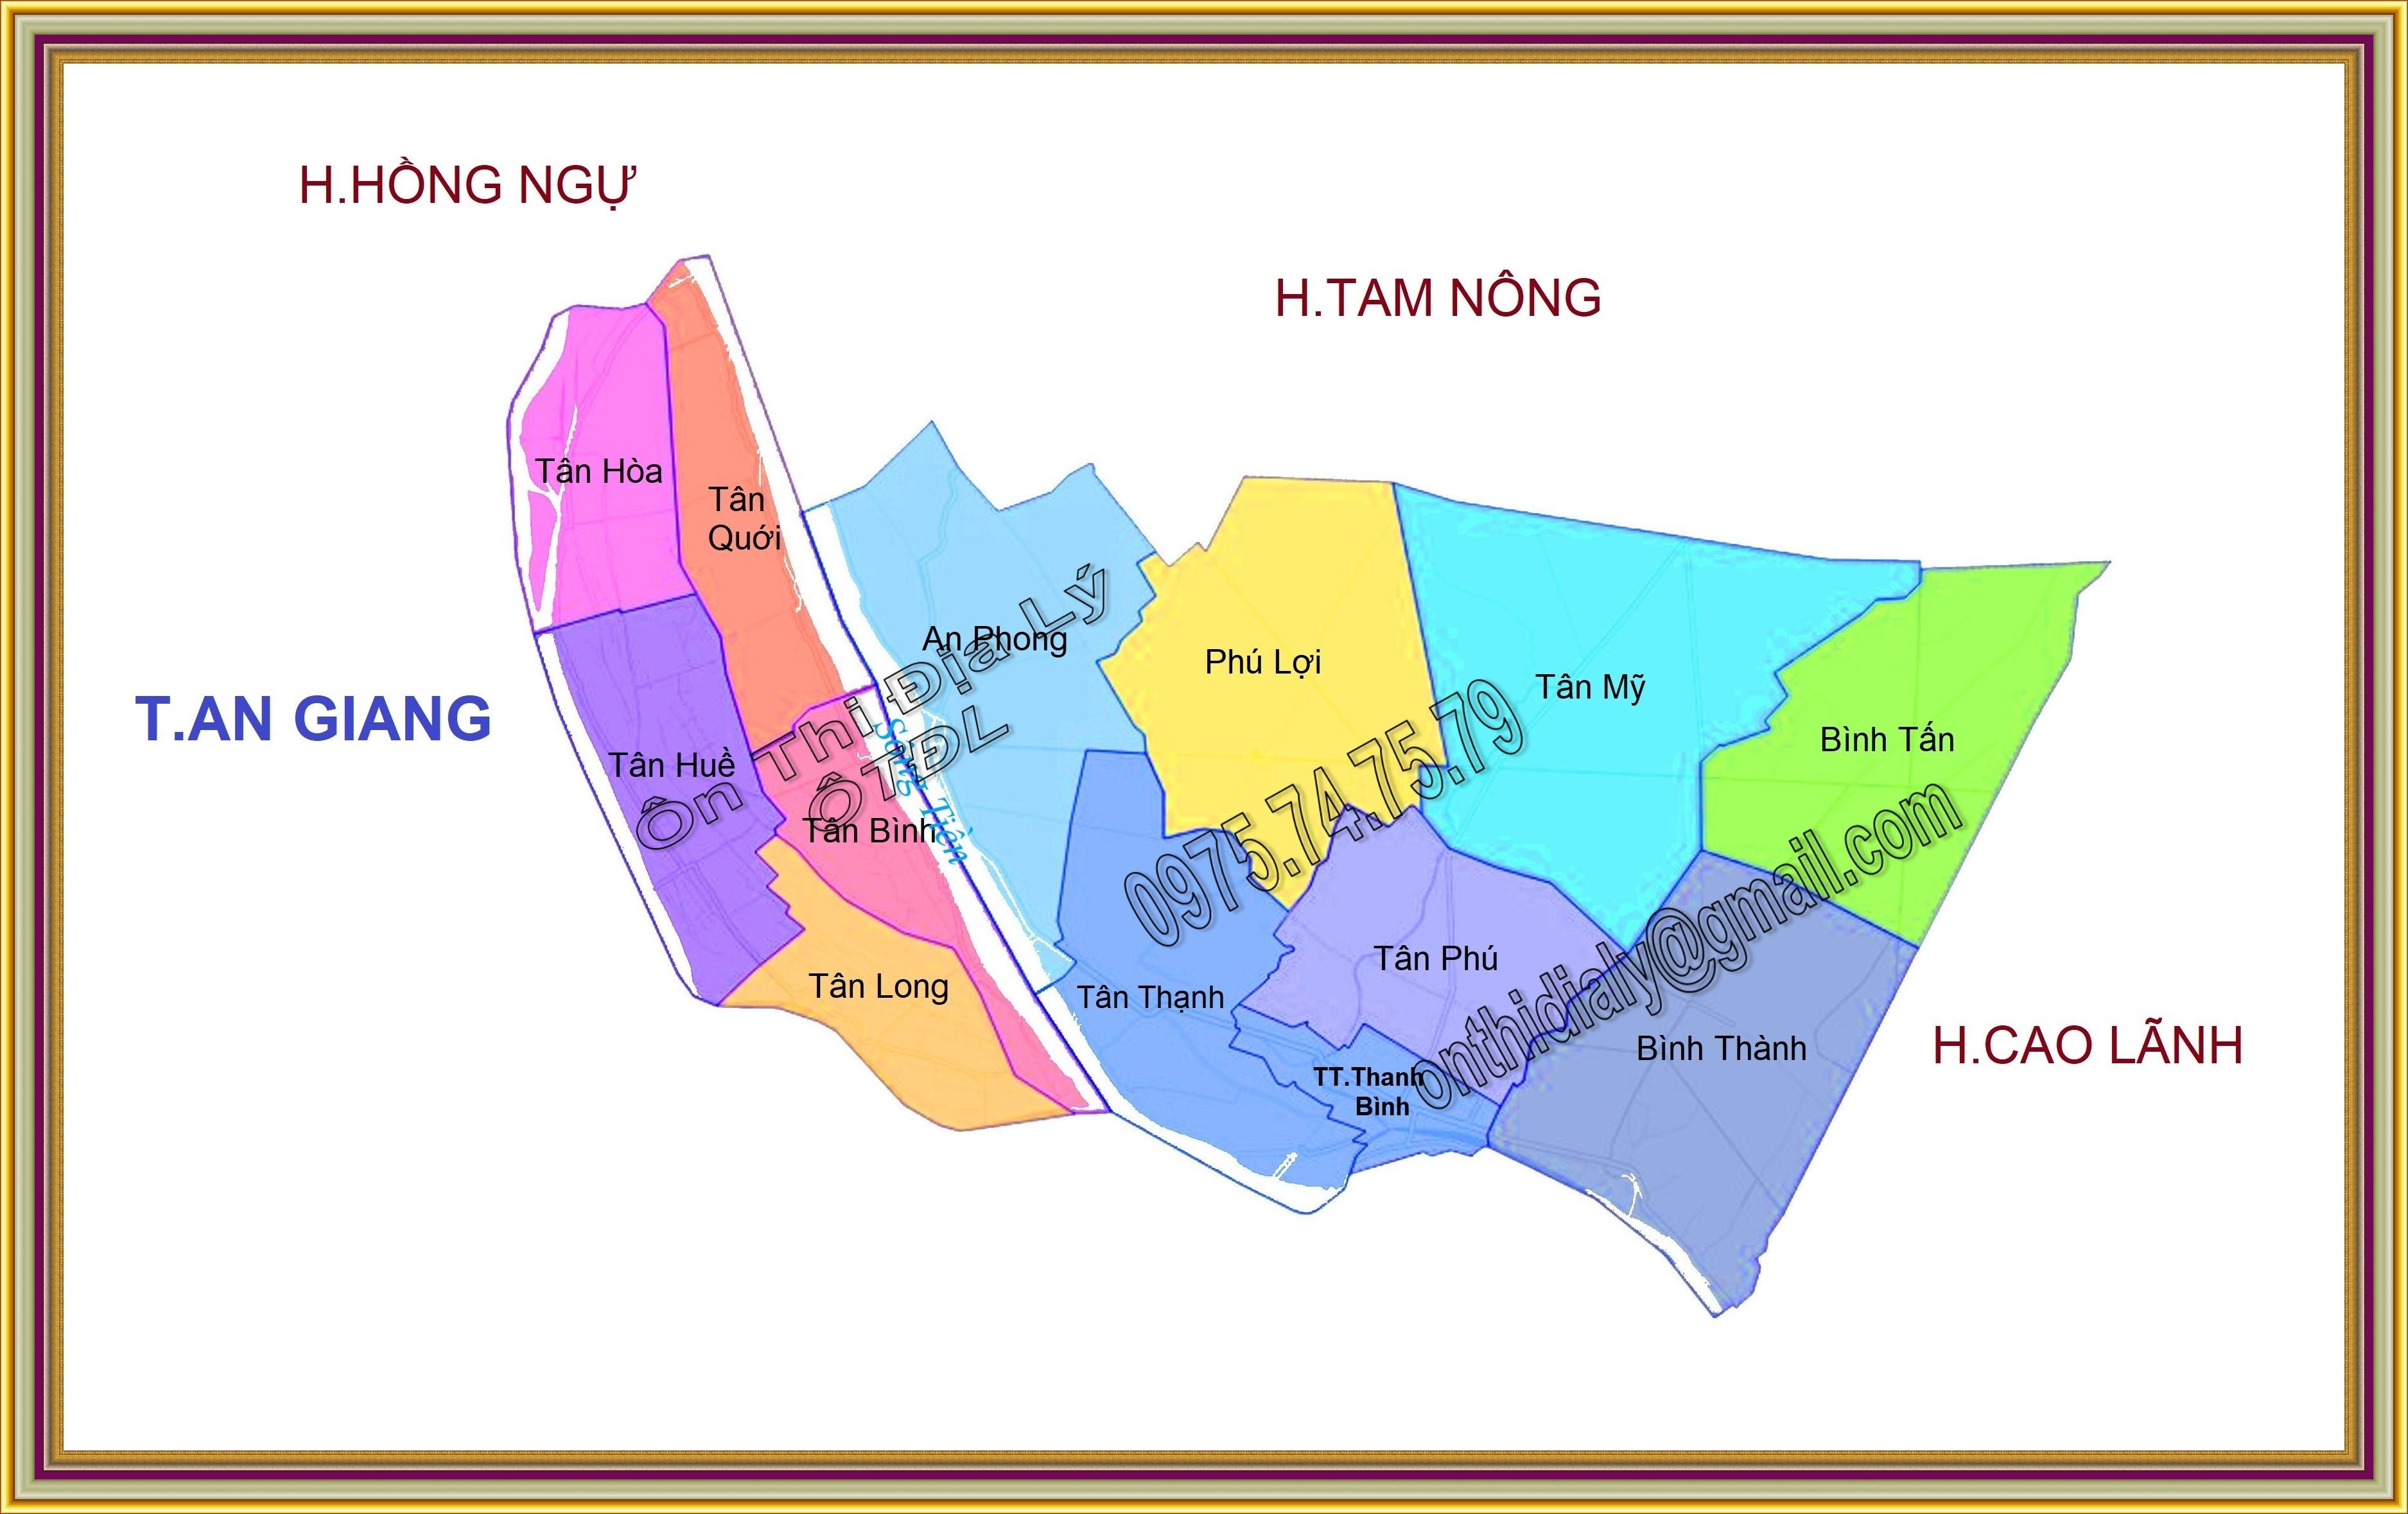 Thanh Binh - Dong Thap 5